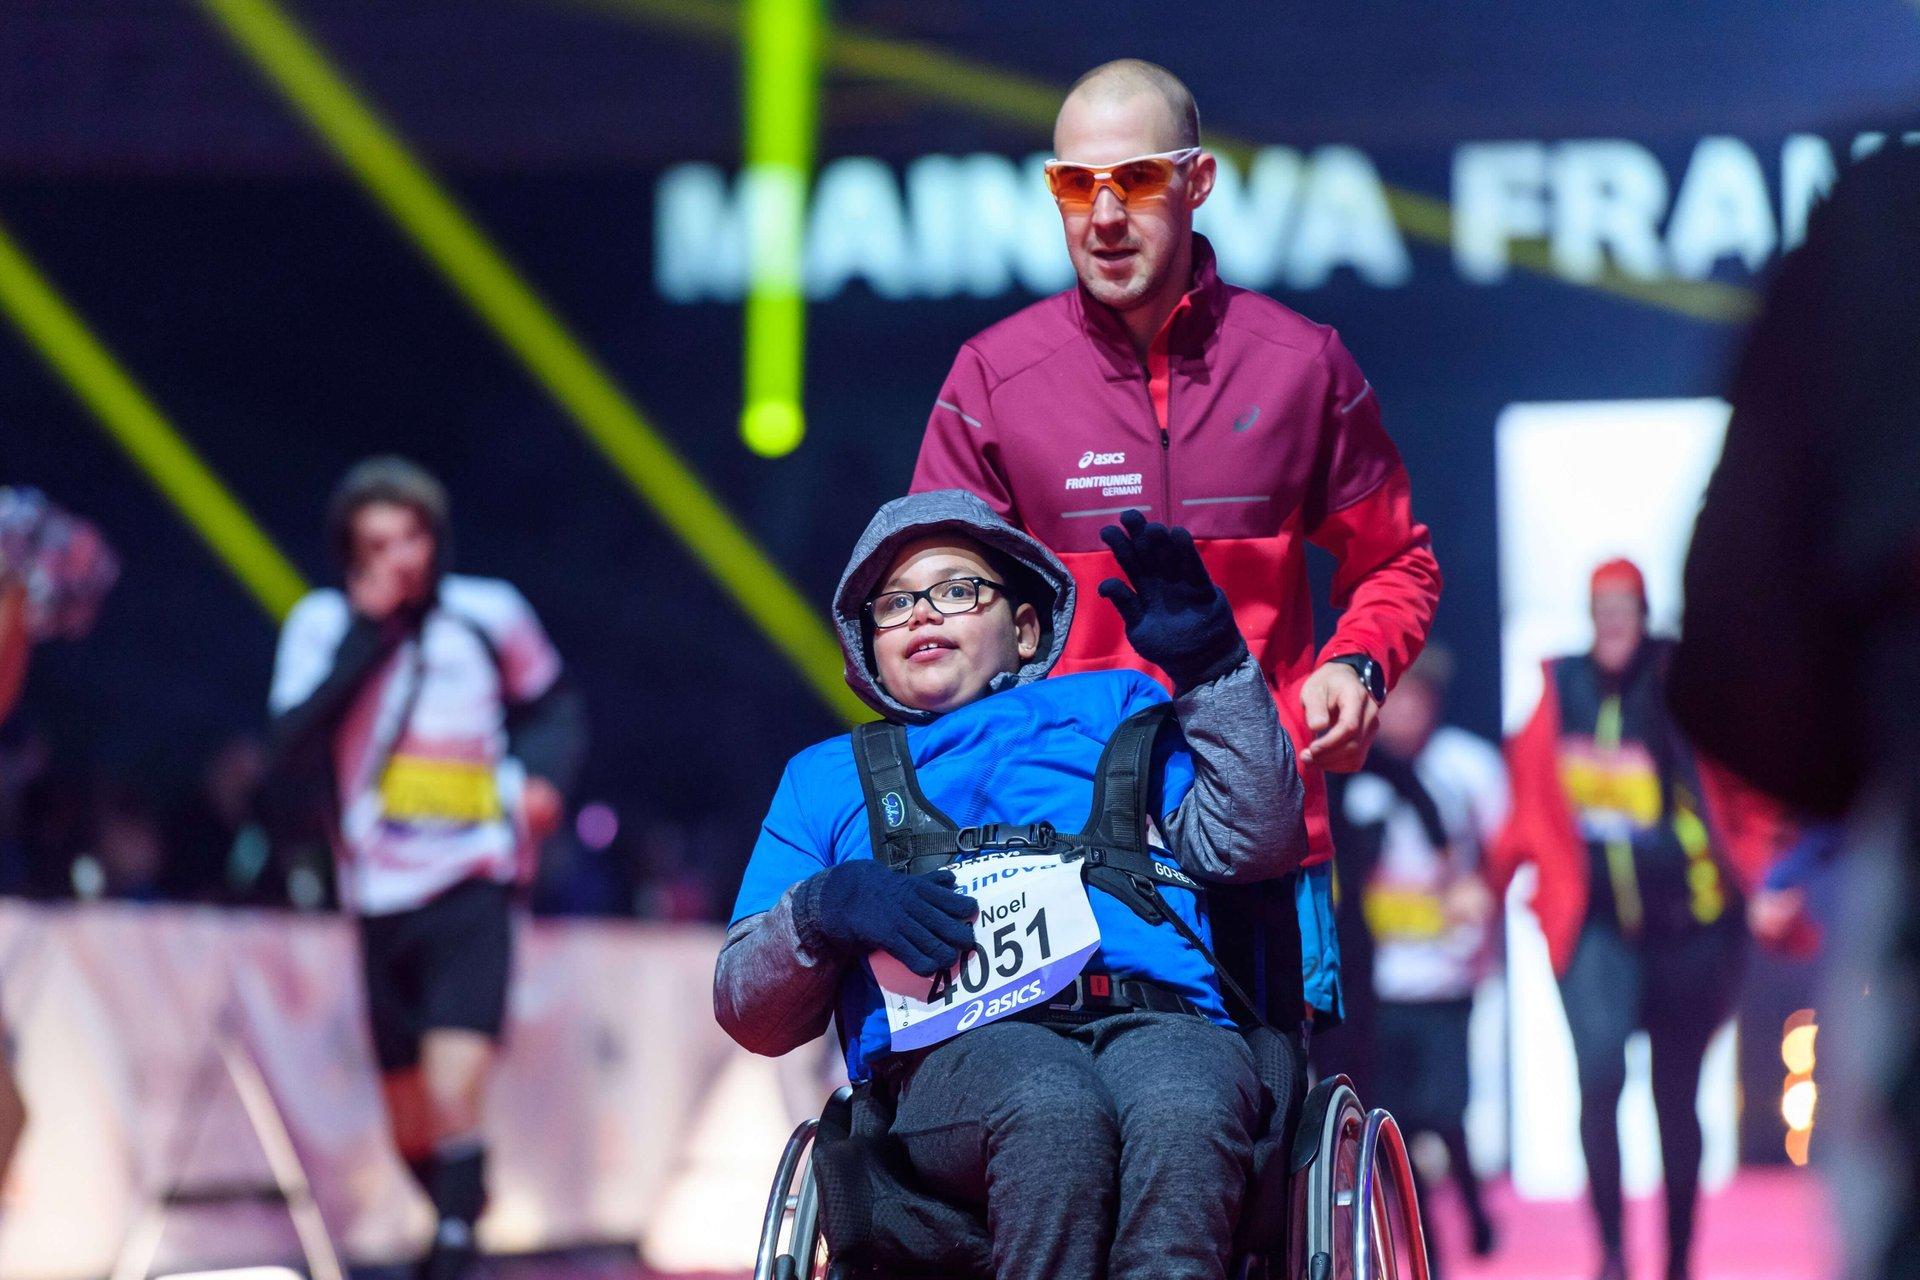 Best time for Frankfurt Marathon in Frankfurt am Main 2020